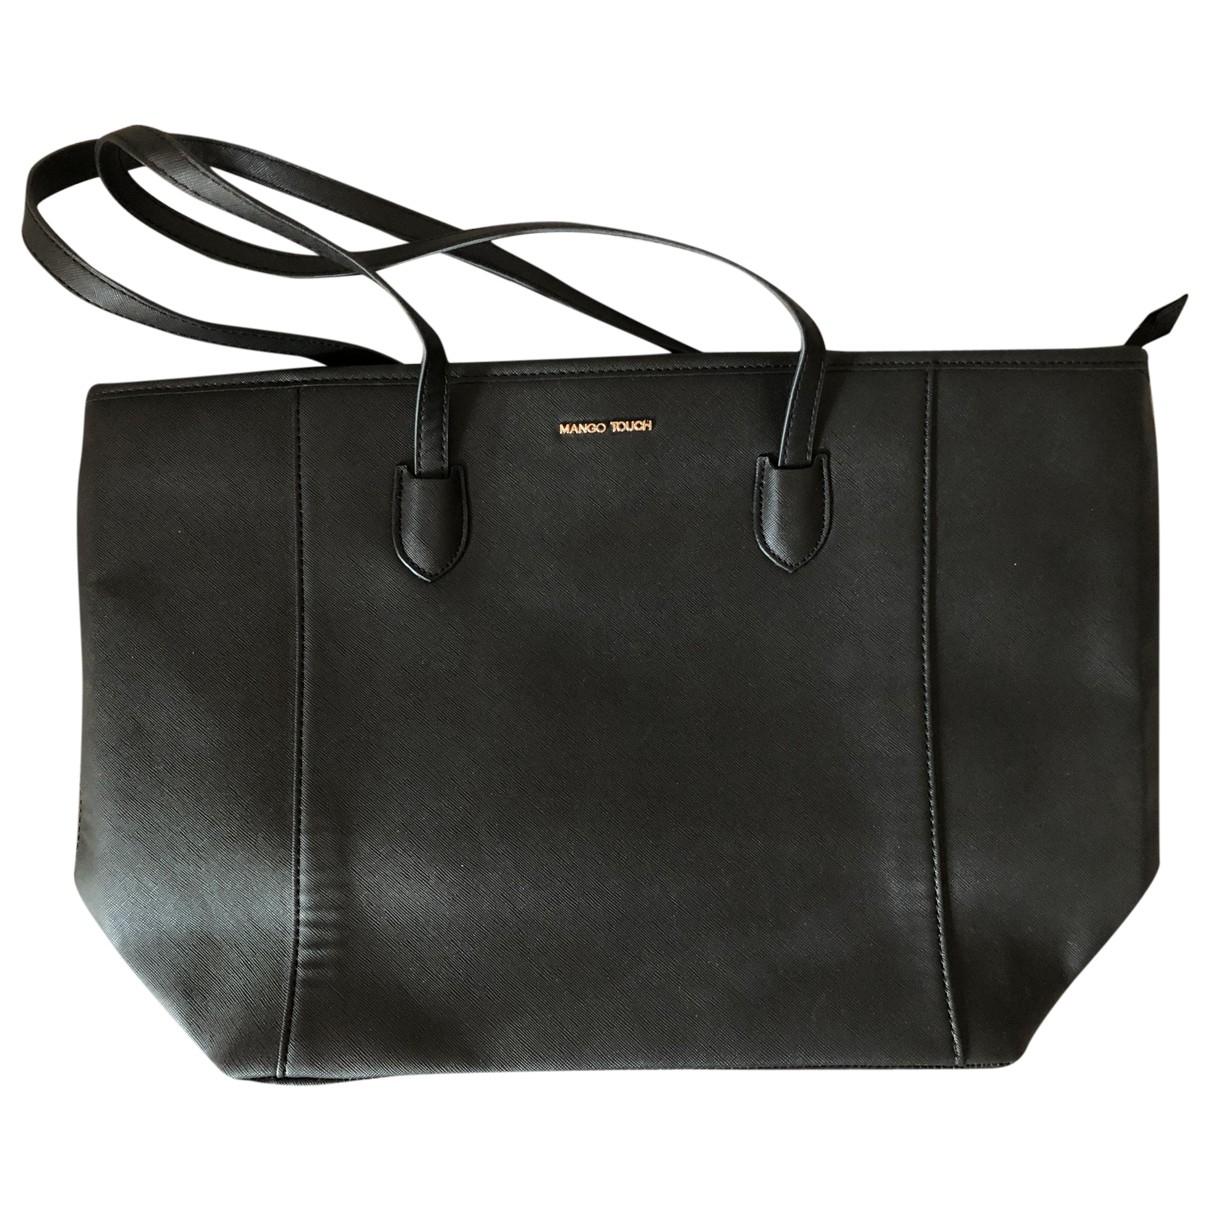 Mango \N Black handbag for Women \N